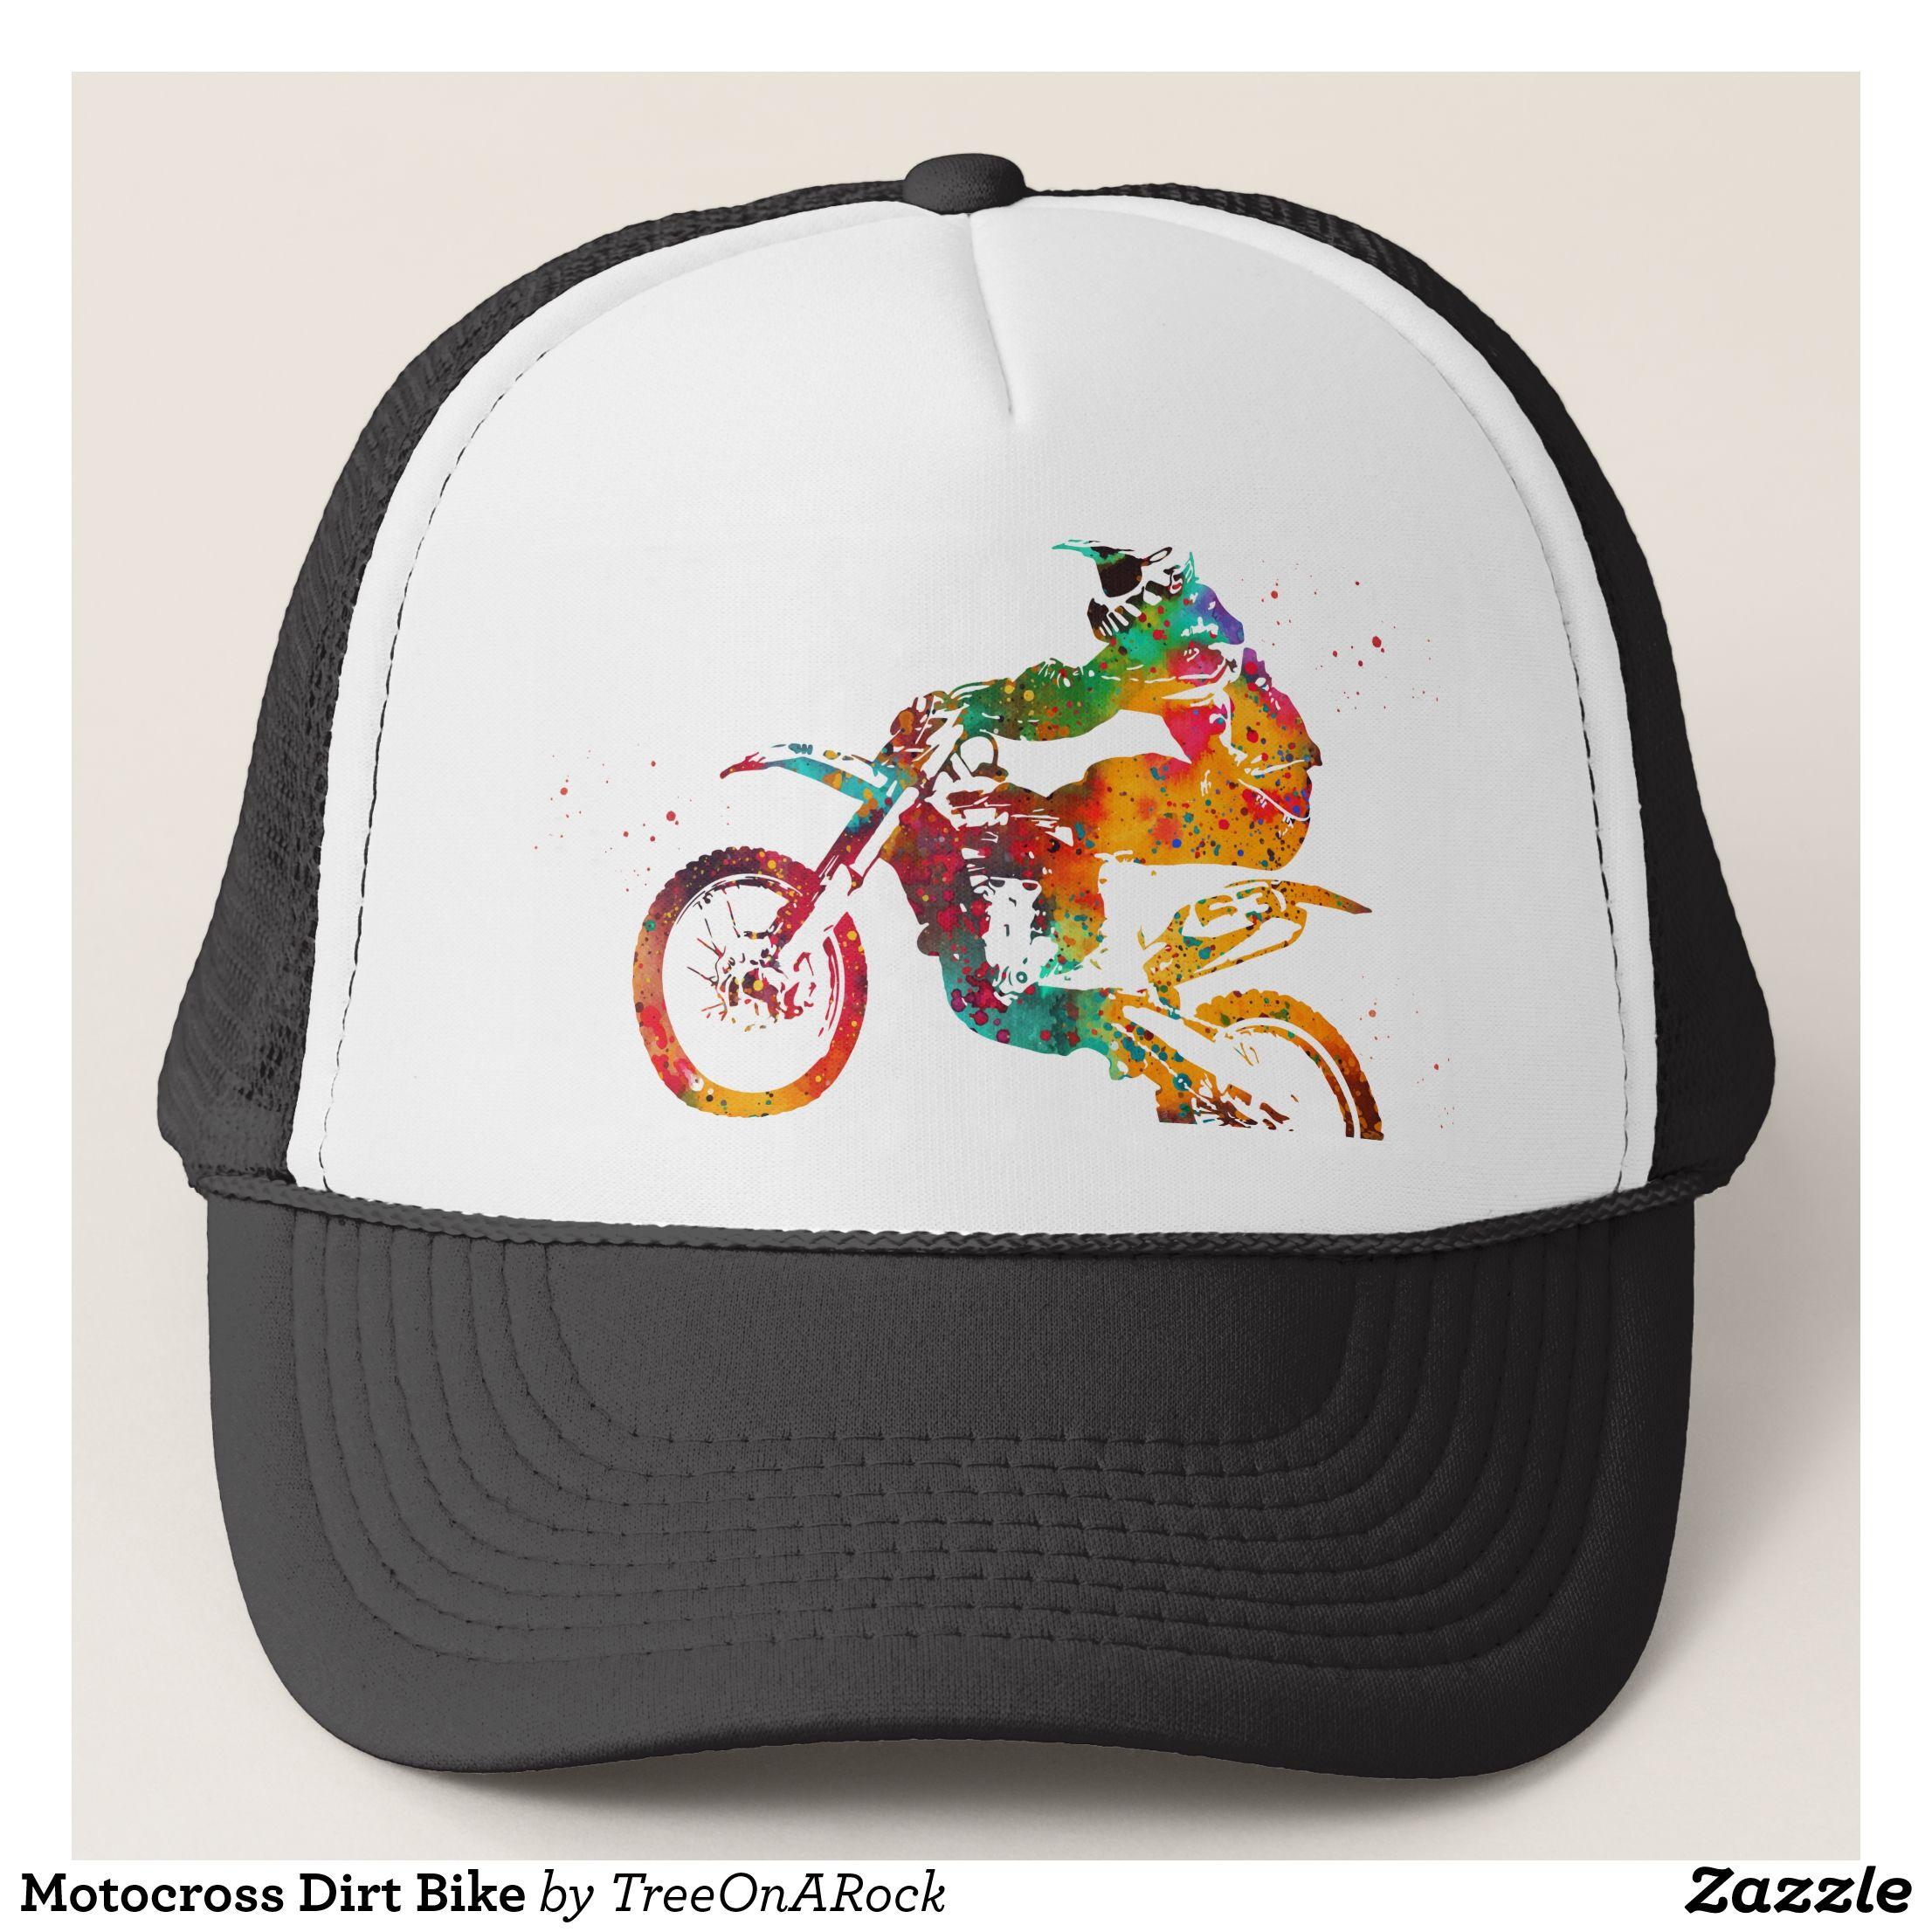 e7e54cd9996c7e Motocross Dirt Bike Trucker Hat - Urban Hunter Fisher Farmer Redneck Hats  By Talented Fashion And Graphic Designers - #hats #truckerhat #mensfashion  ...